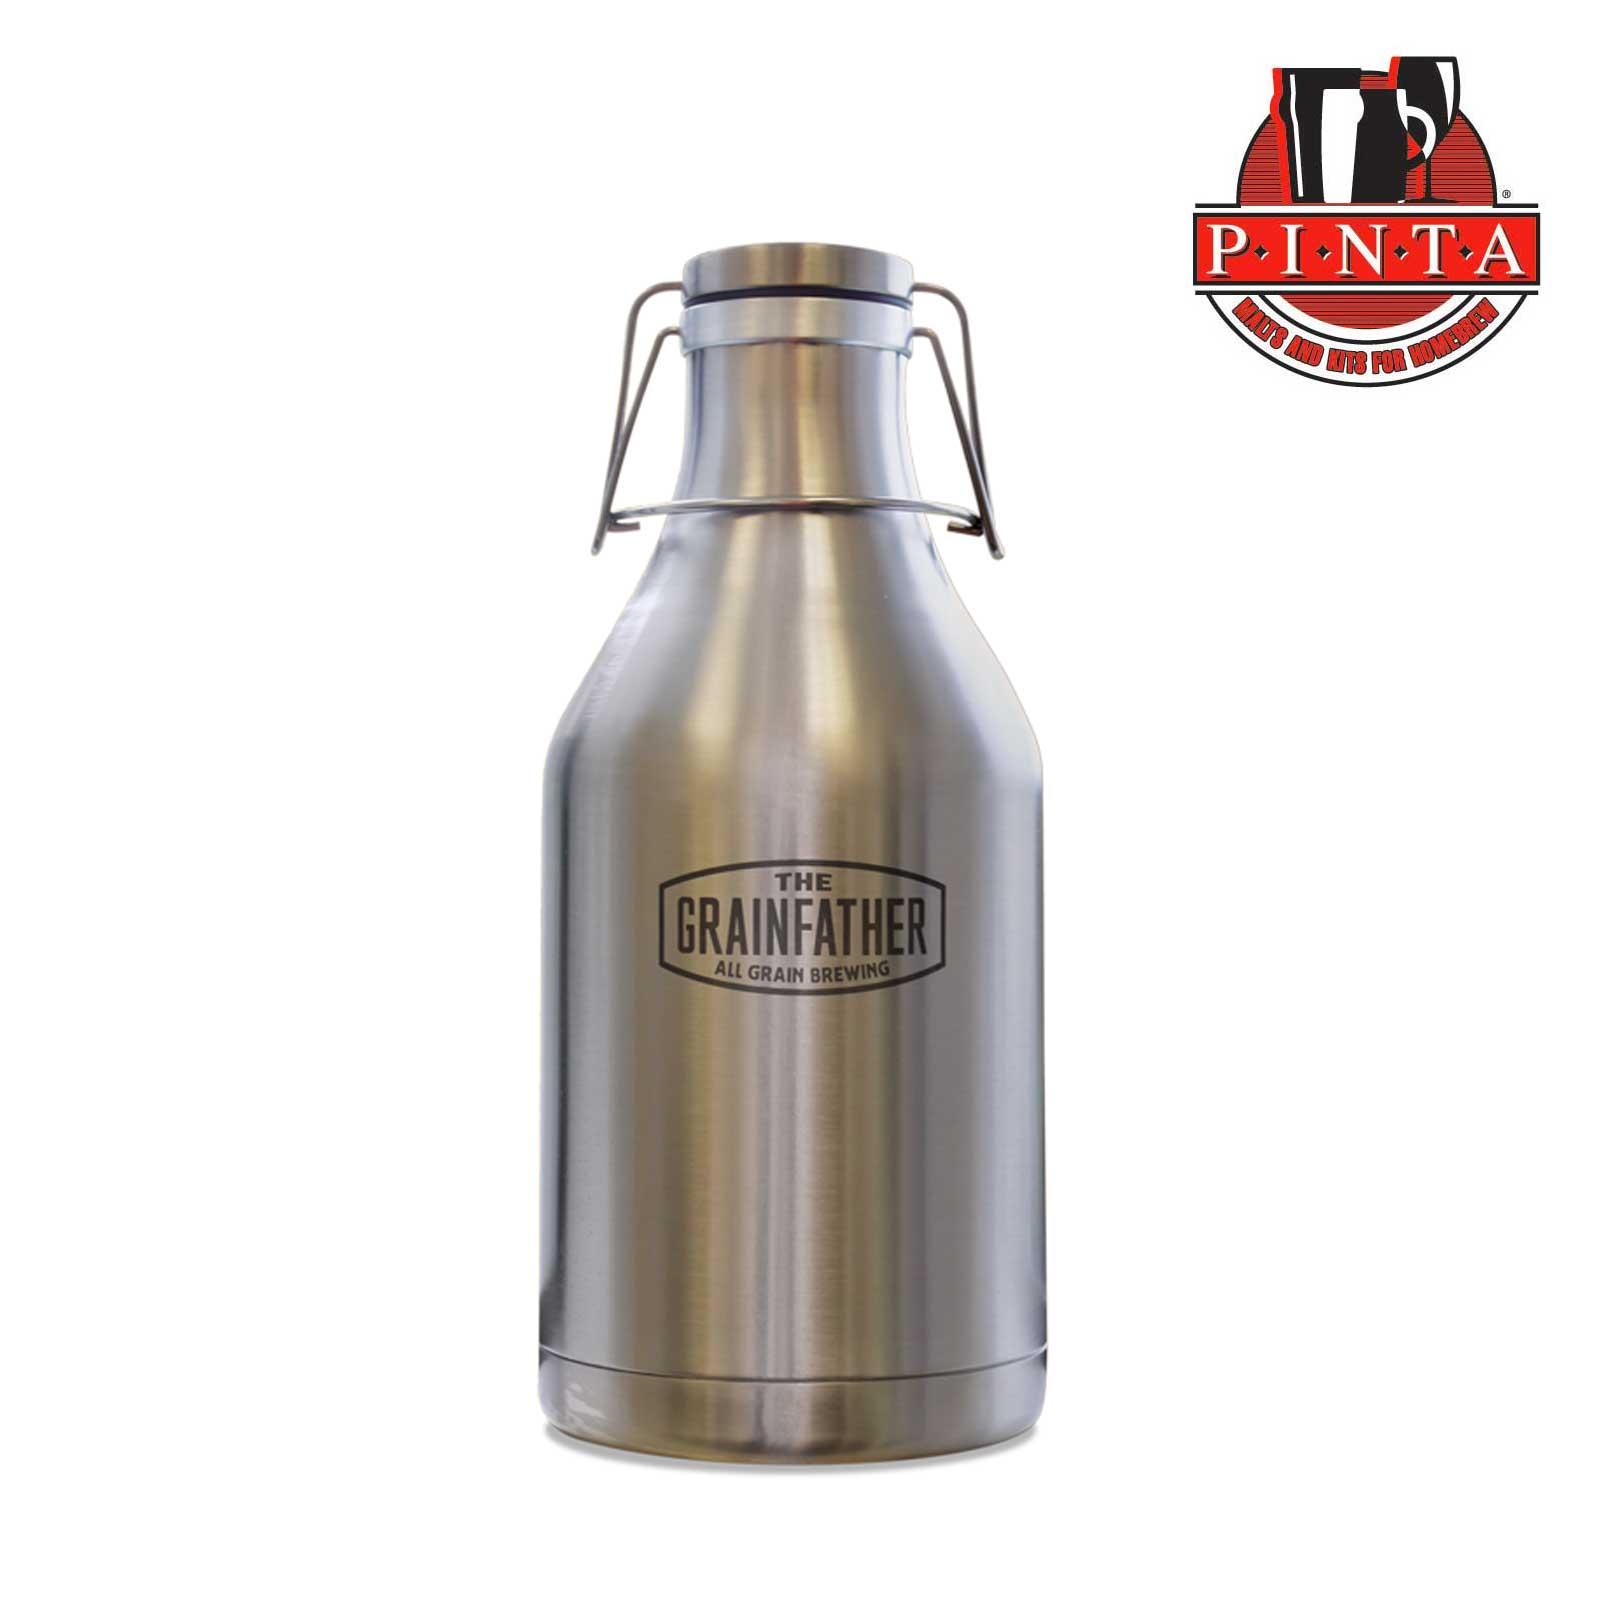 Beer Growler - Bottiglia termica per birra 2 lt